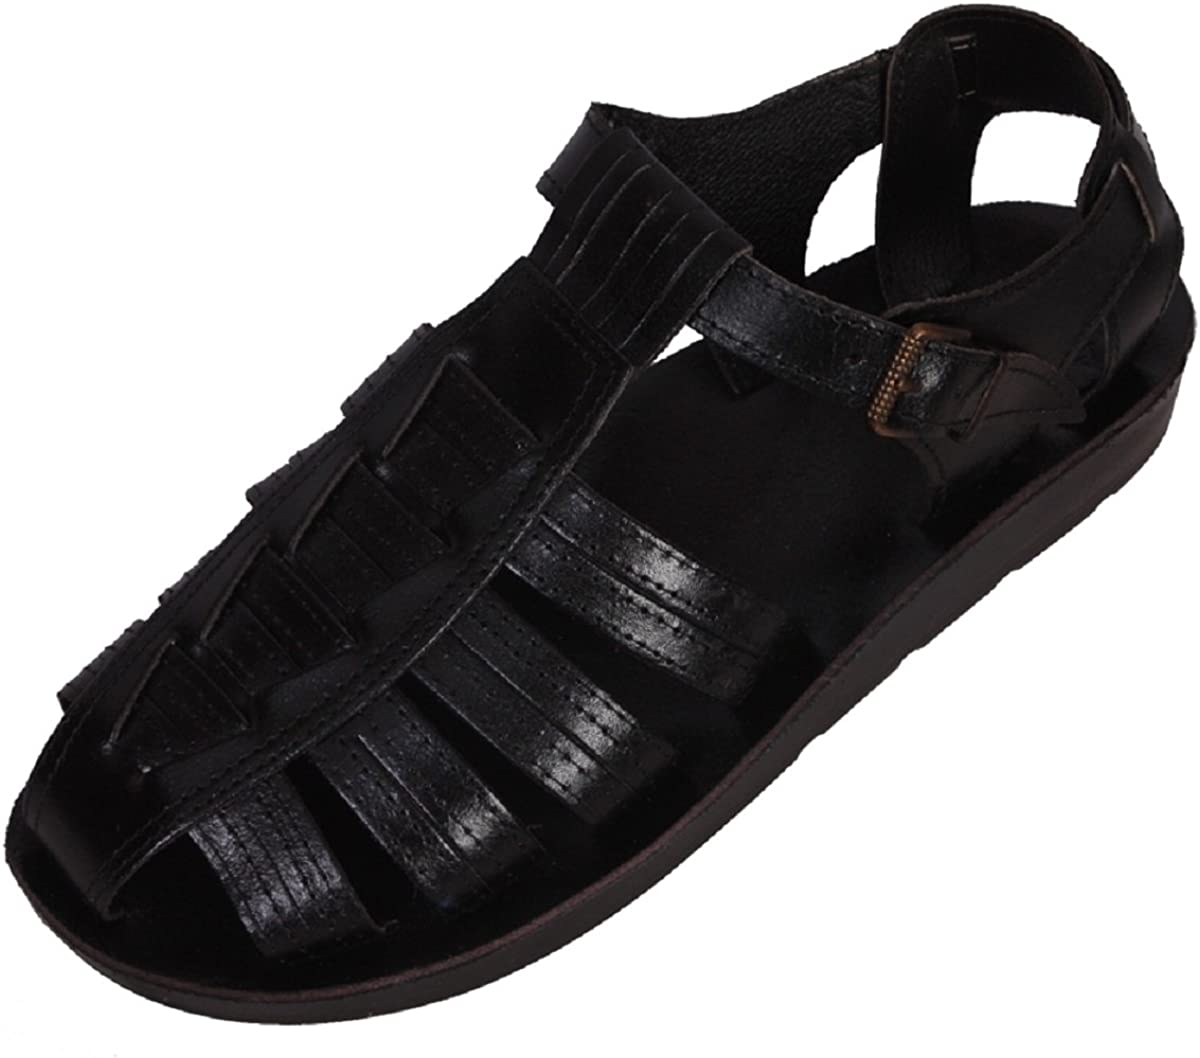 Ferrari Unisex Genuine Black Leather Style #904 Jesus Biblical Greek Roman Sandals